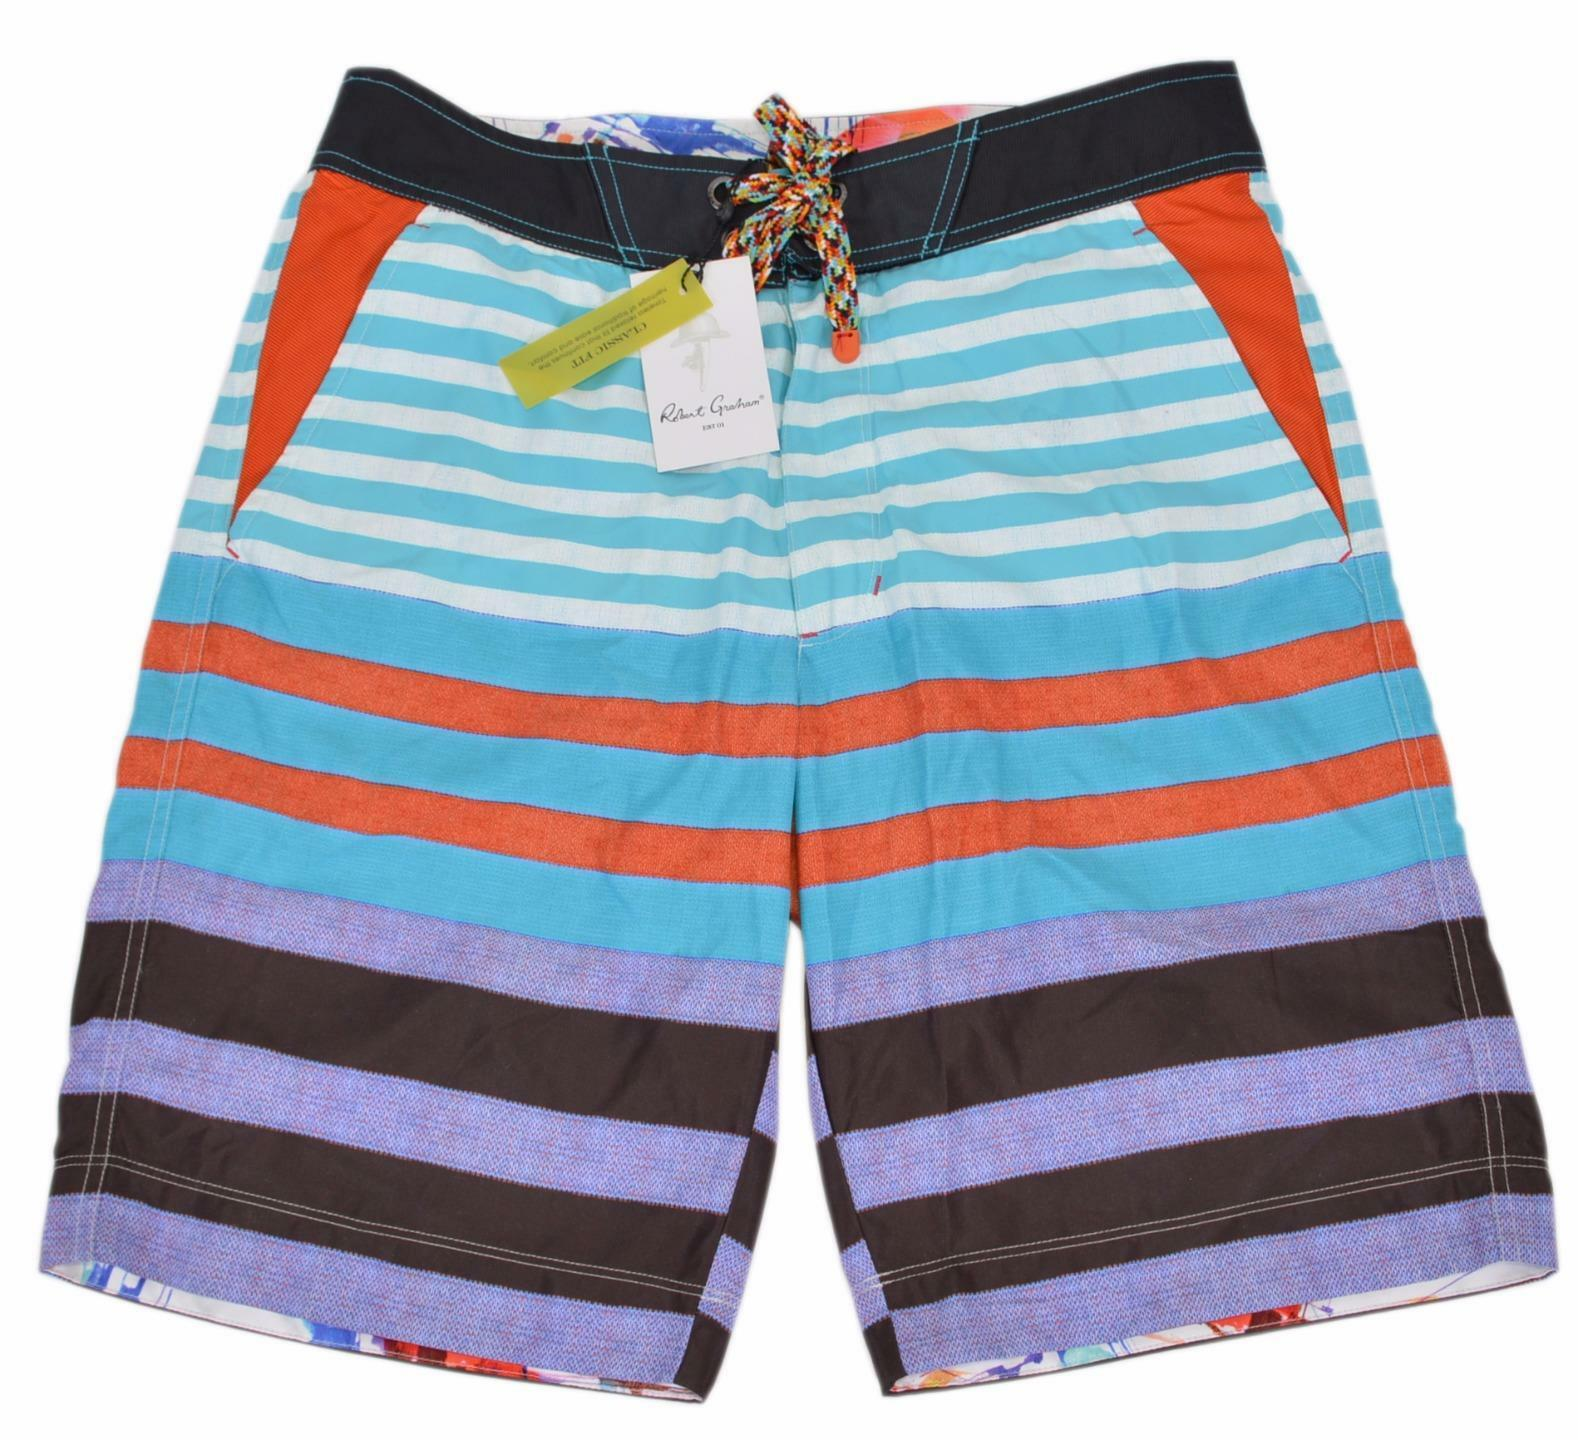 NEW Robert Graham Classic Fit INMAN LINE Board Shorts Swim Trunks